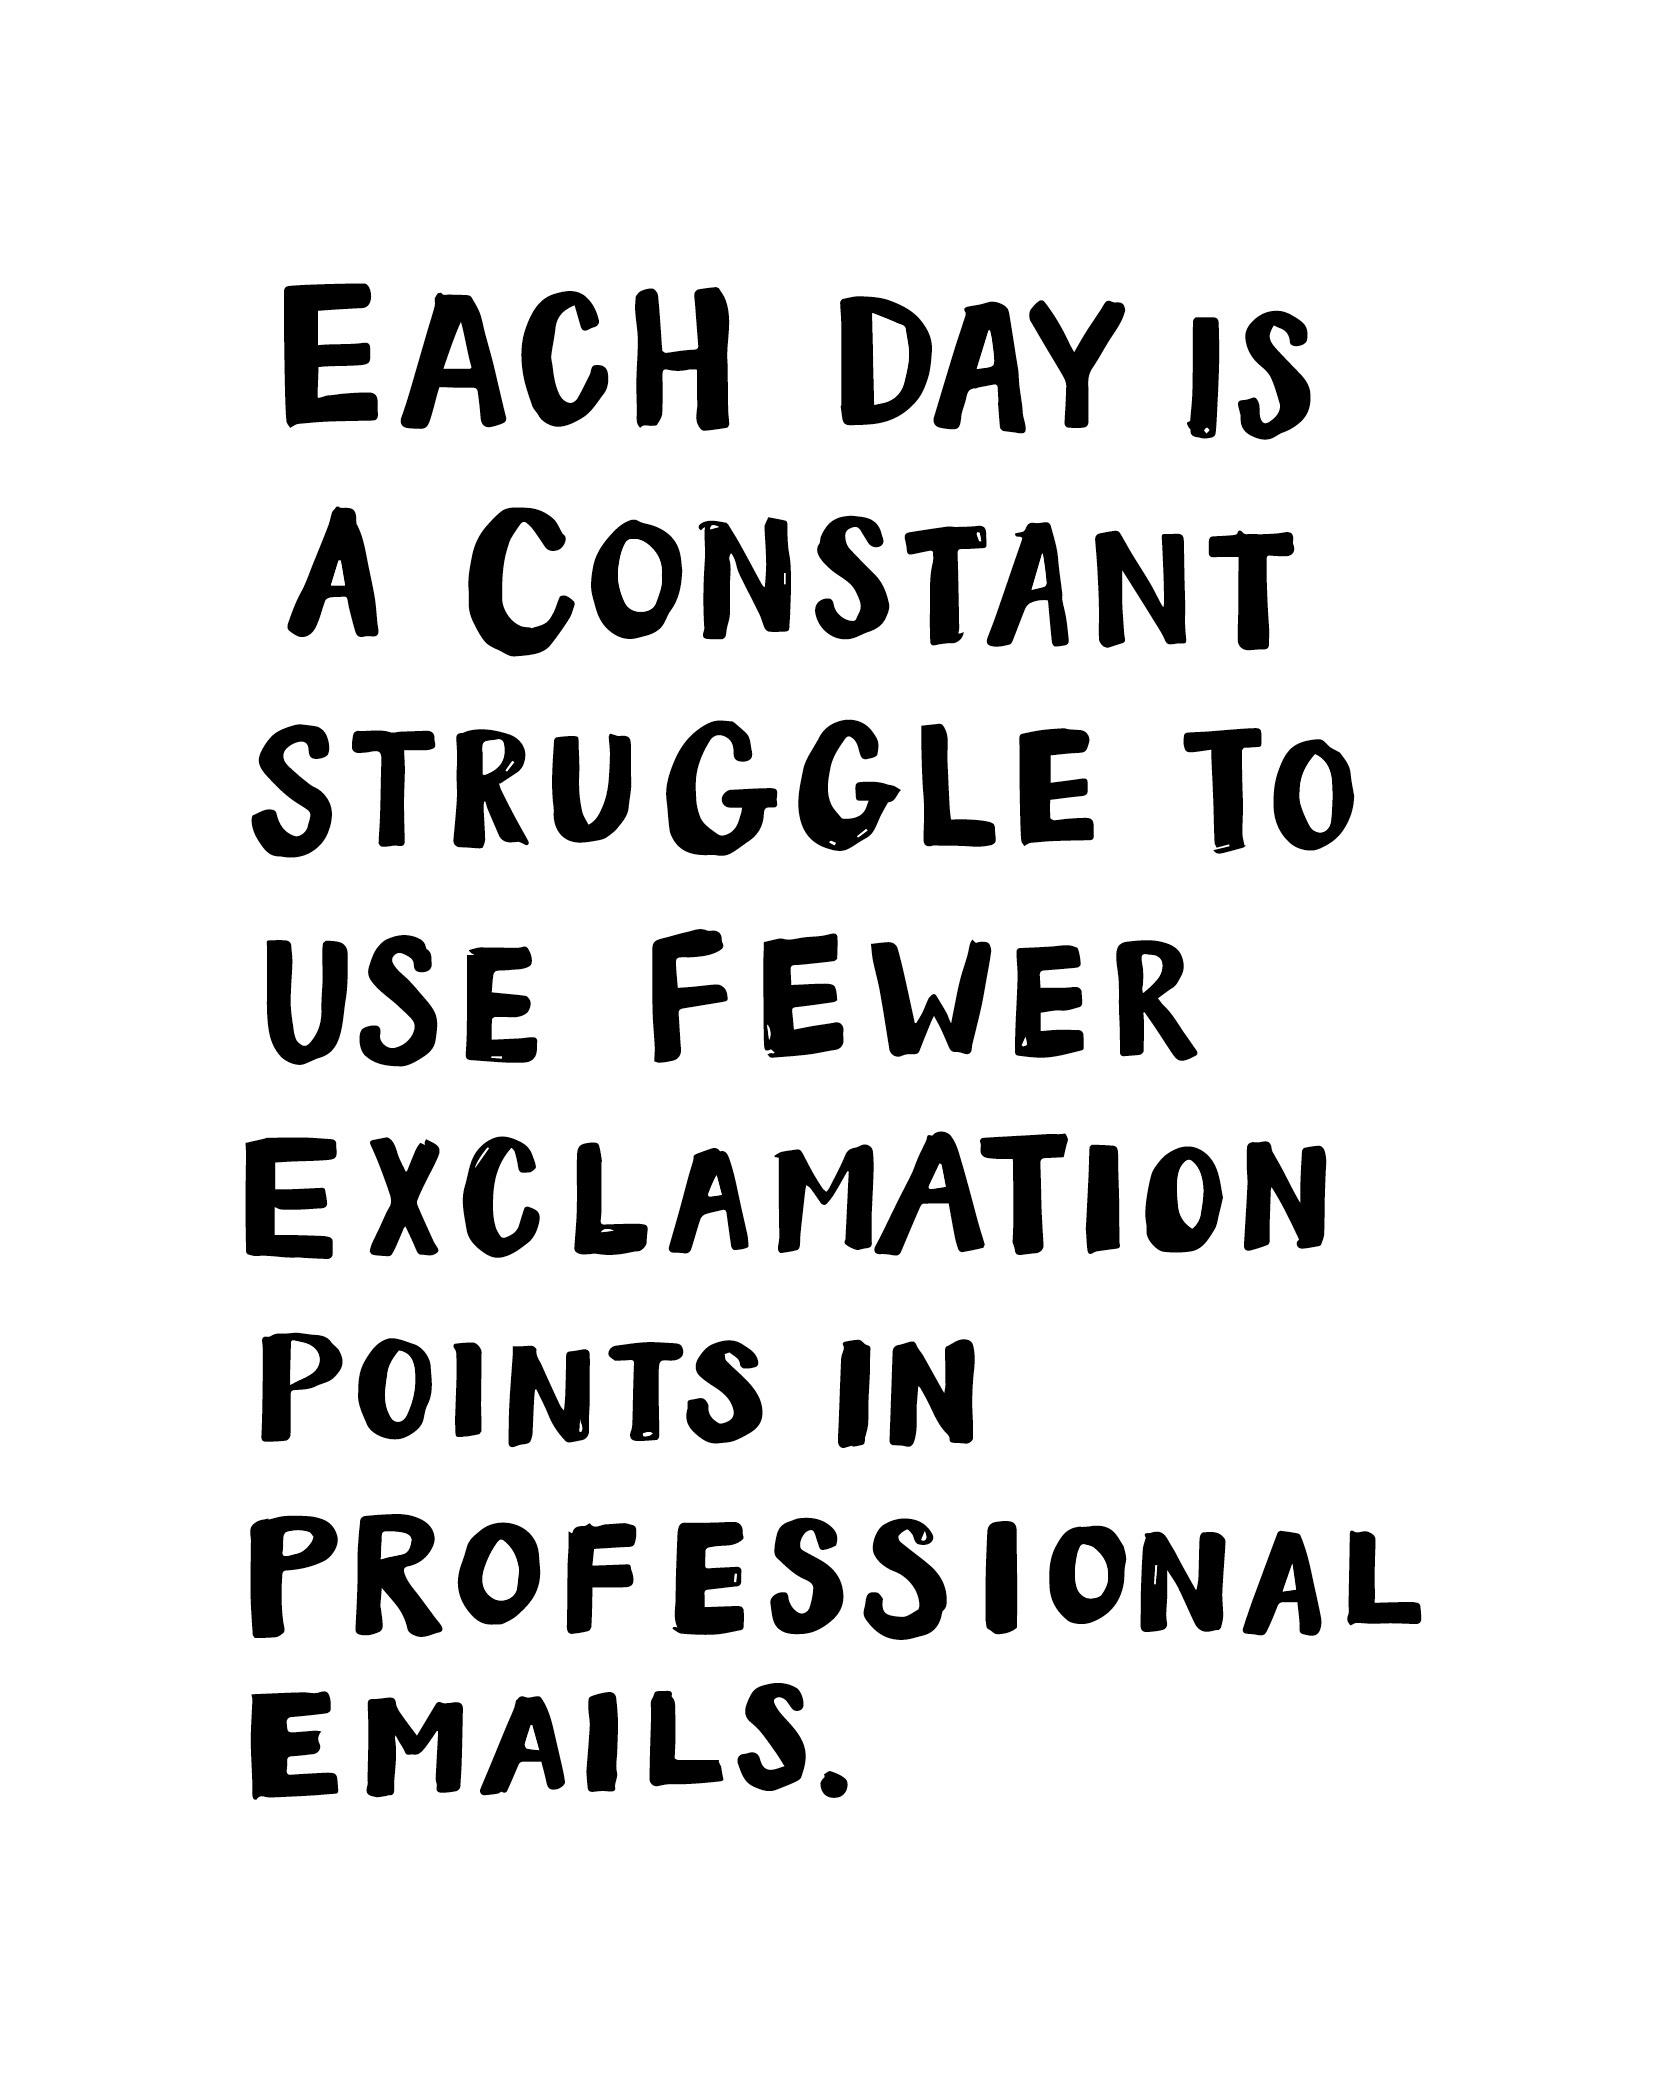 professional_emails.jpg